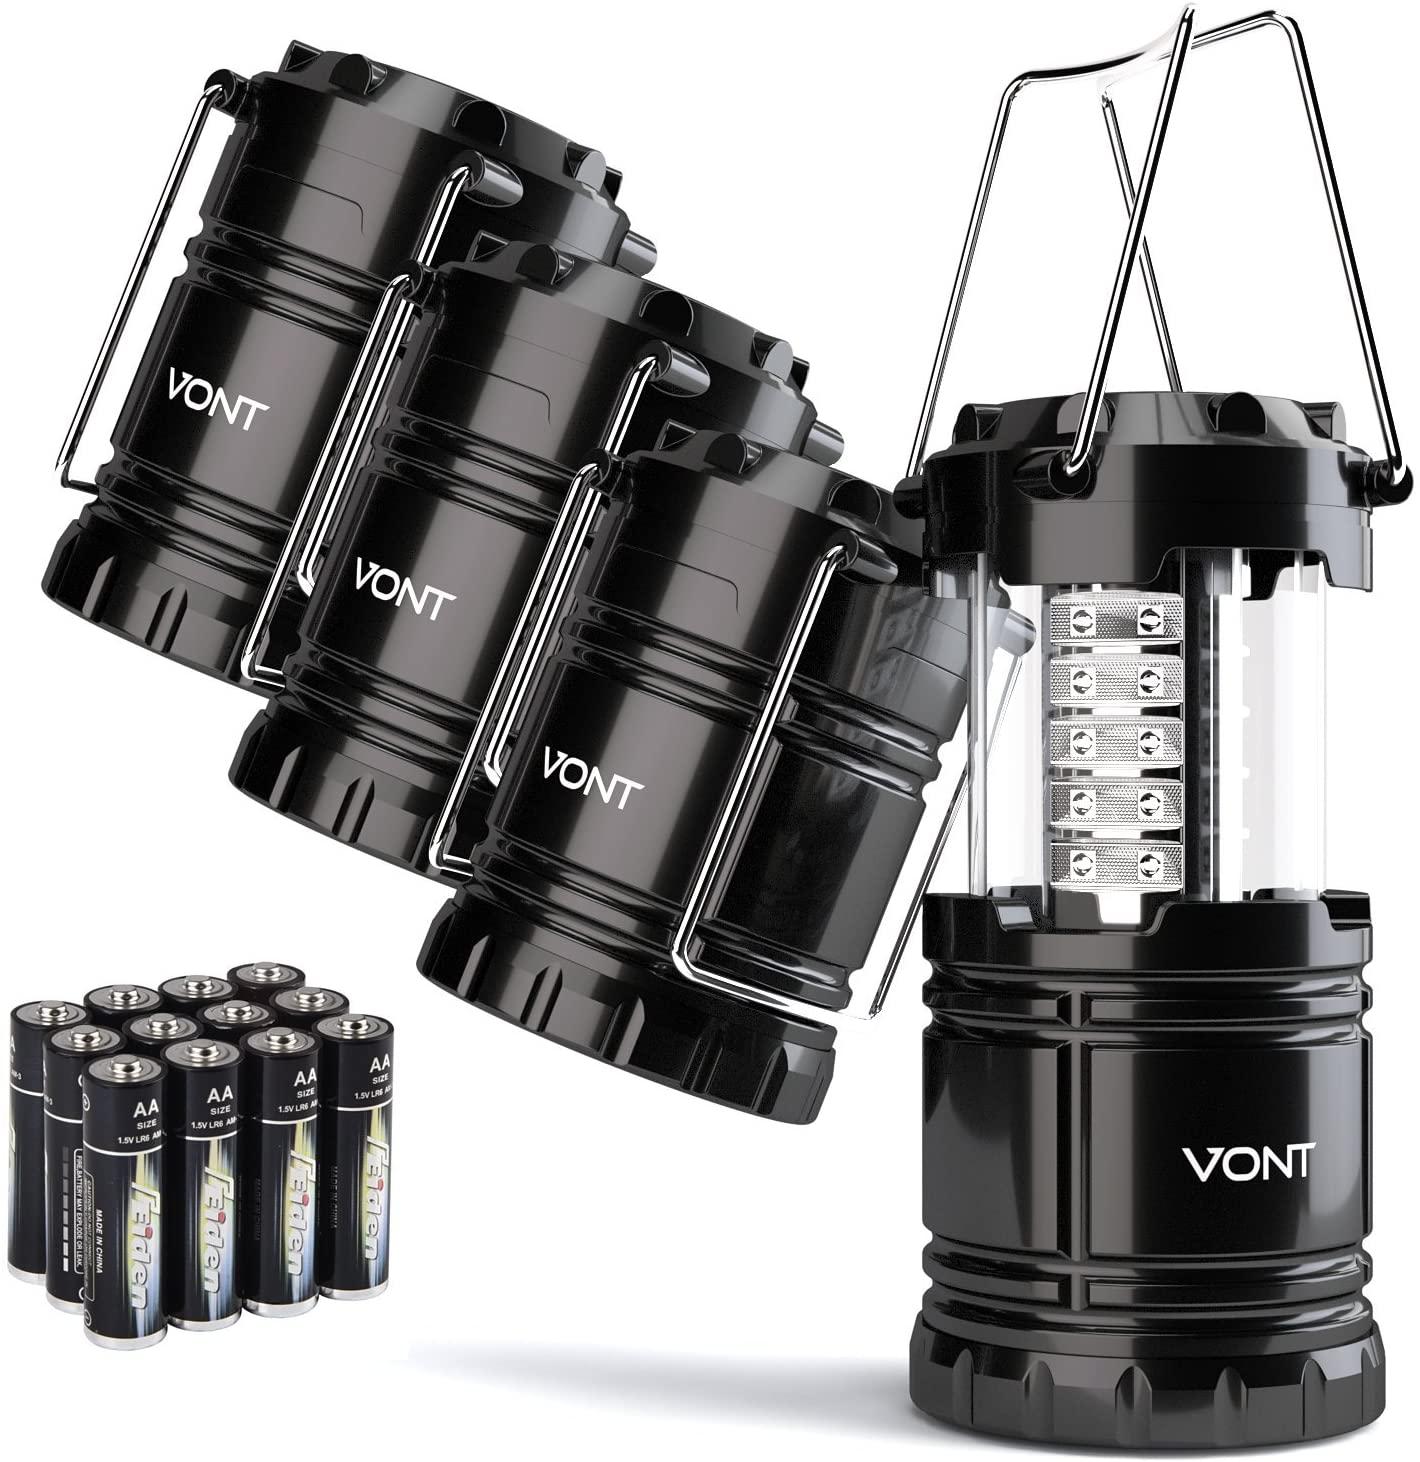 Vont LED Lantern